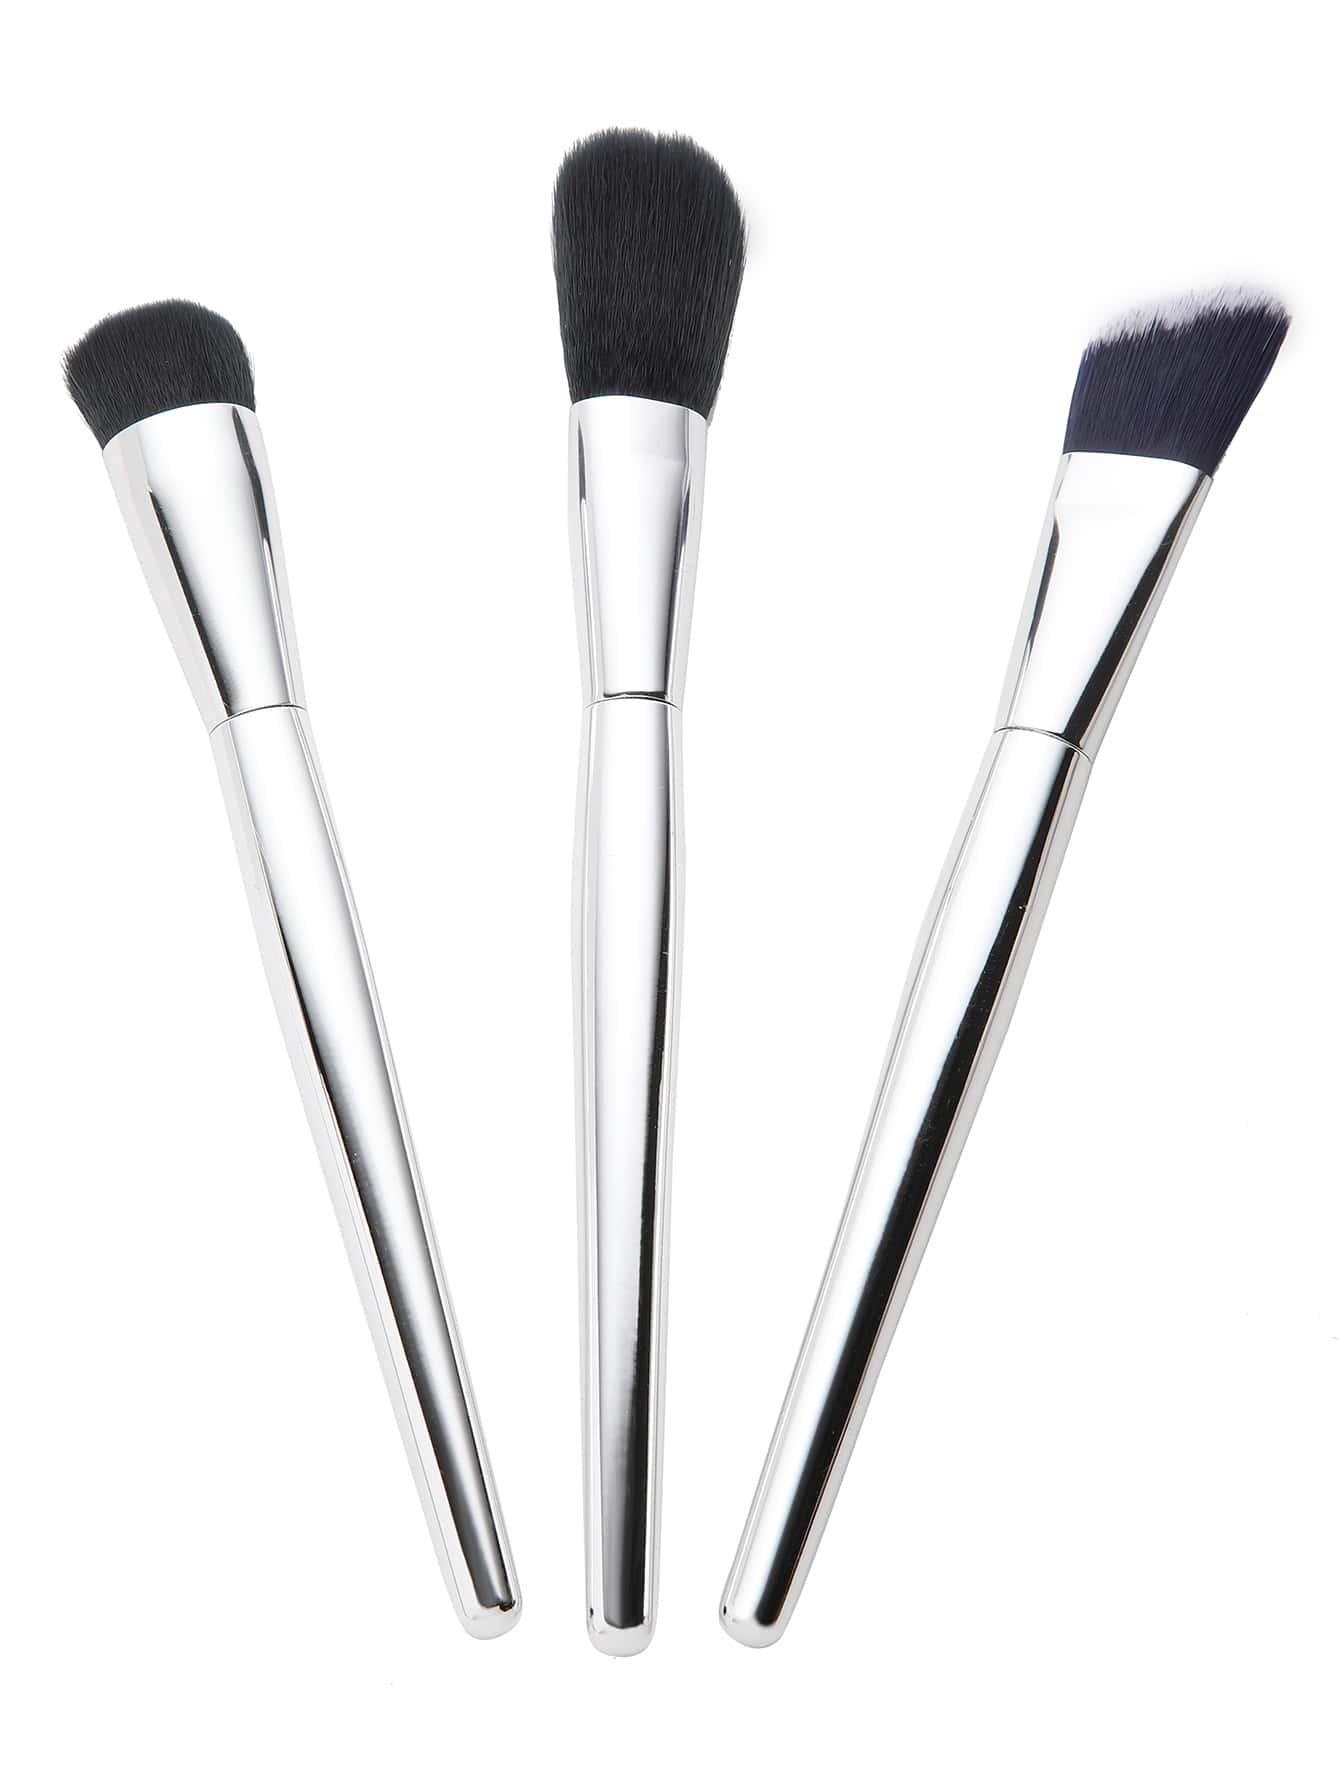 Фото Delicate Cosmetic Brush 3pcs. Купить с доставкой